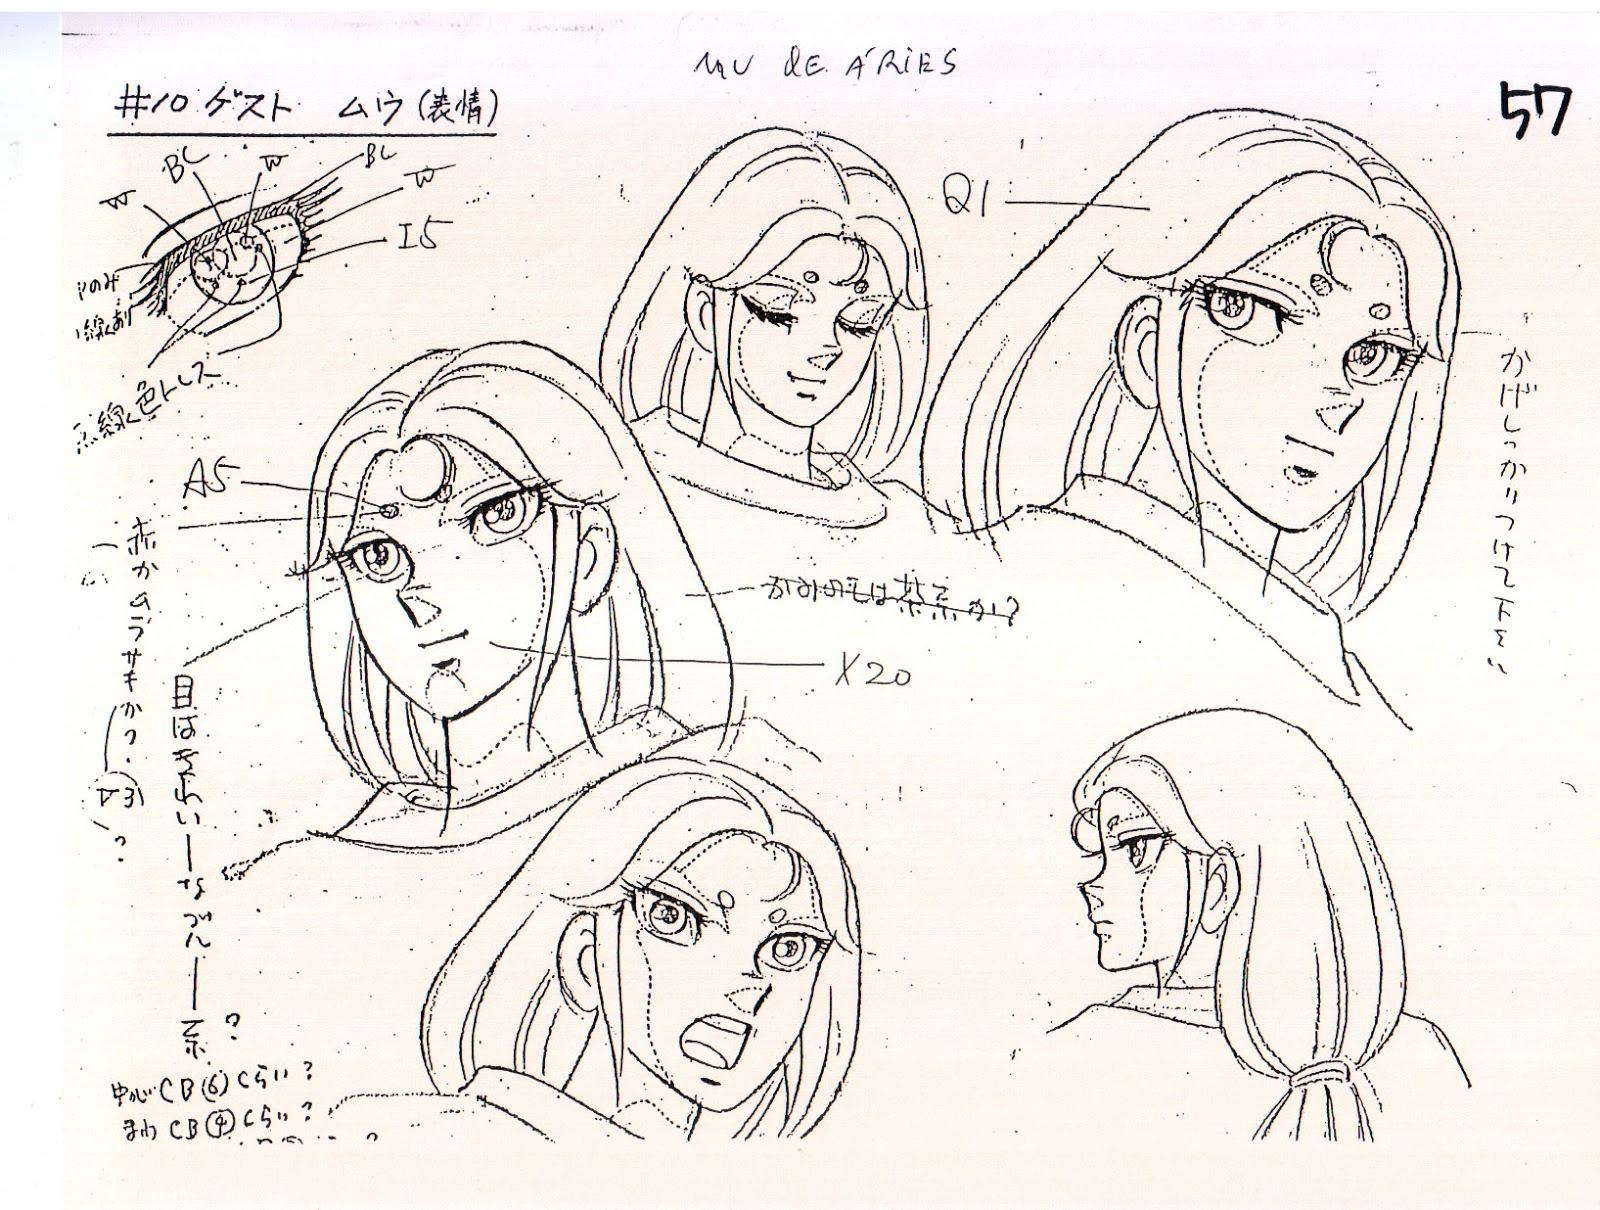 Saint_Seiya_Characters57.jpg